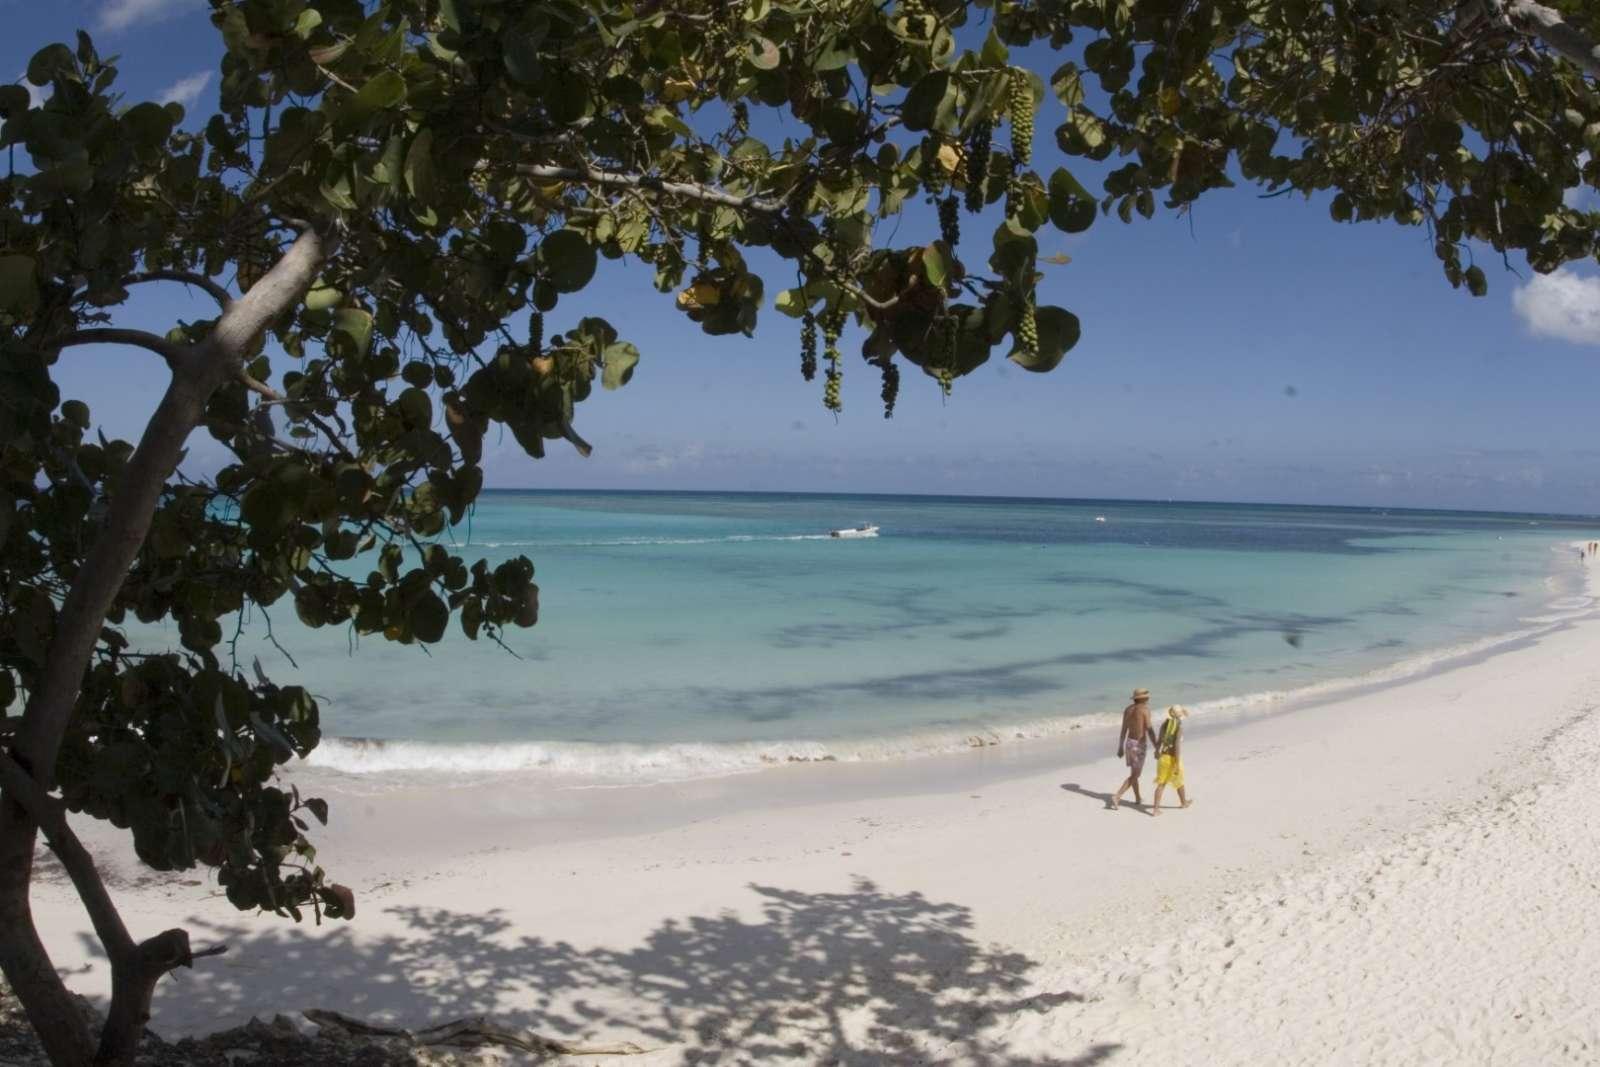 Couple walking along a beautiful beach in Guardalavaca, Cuba